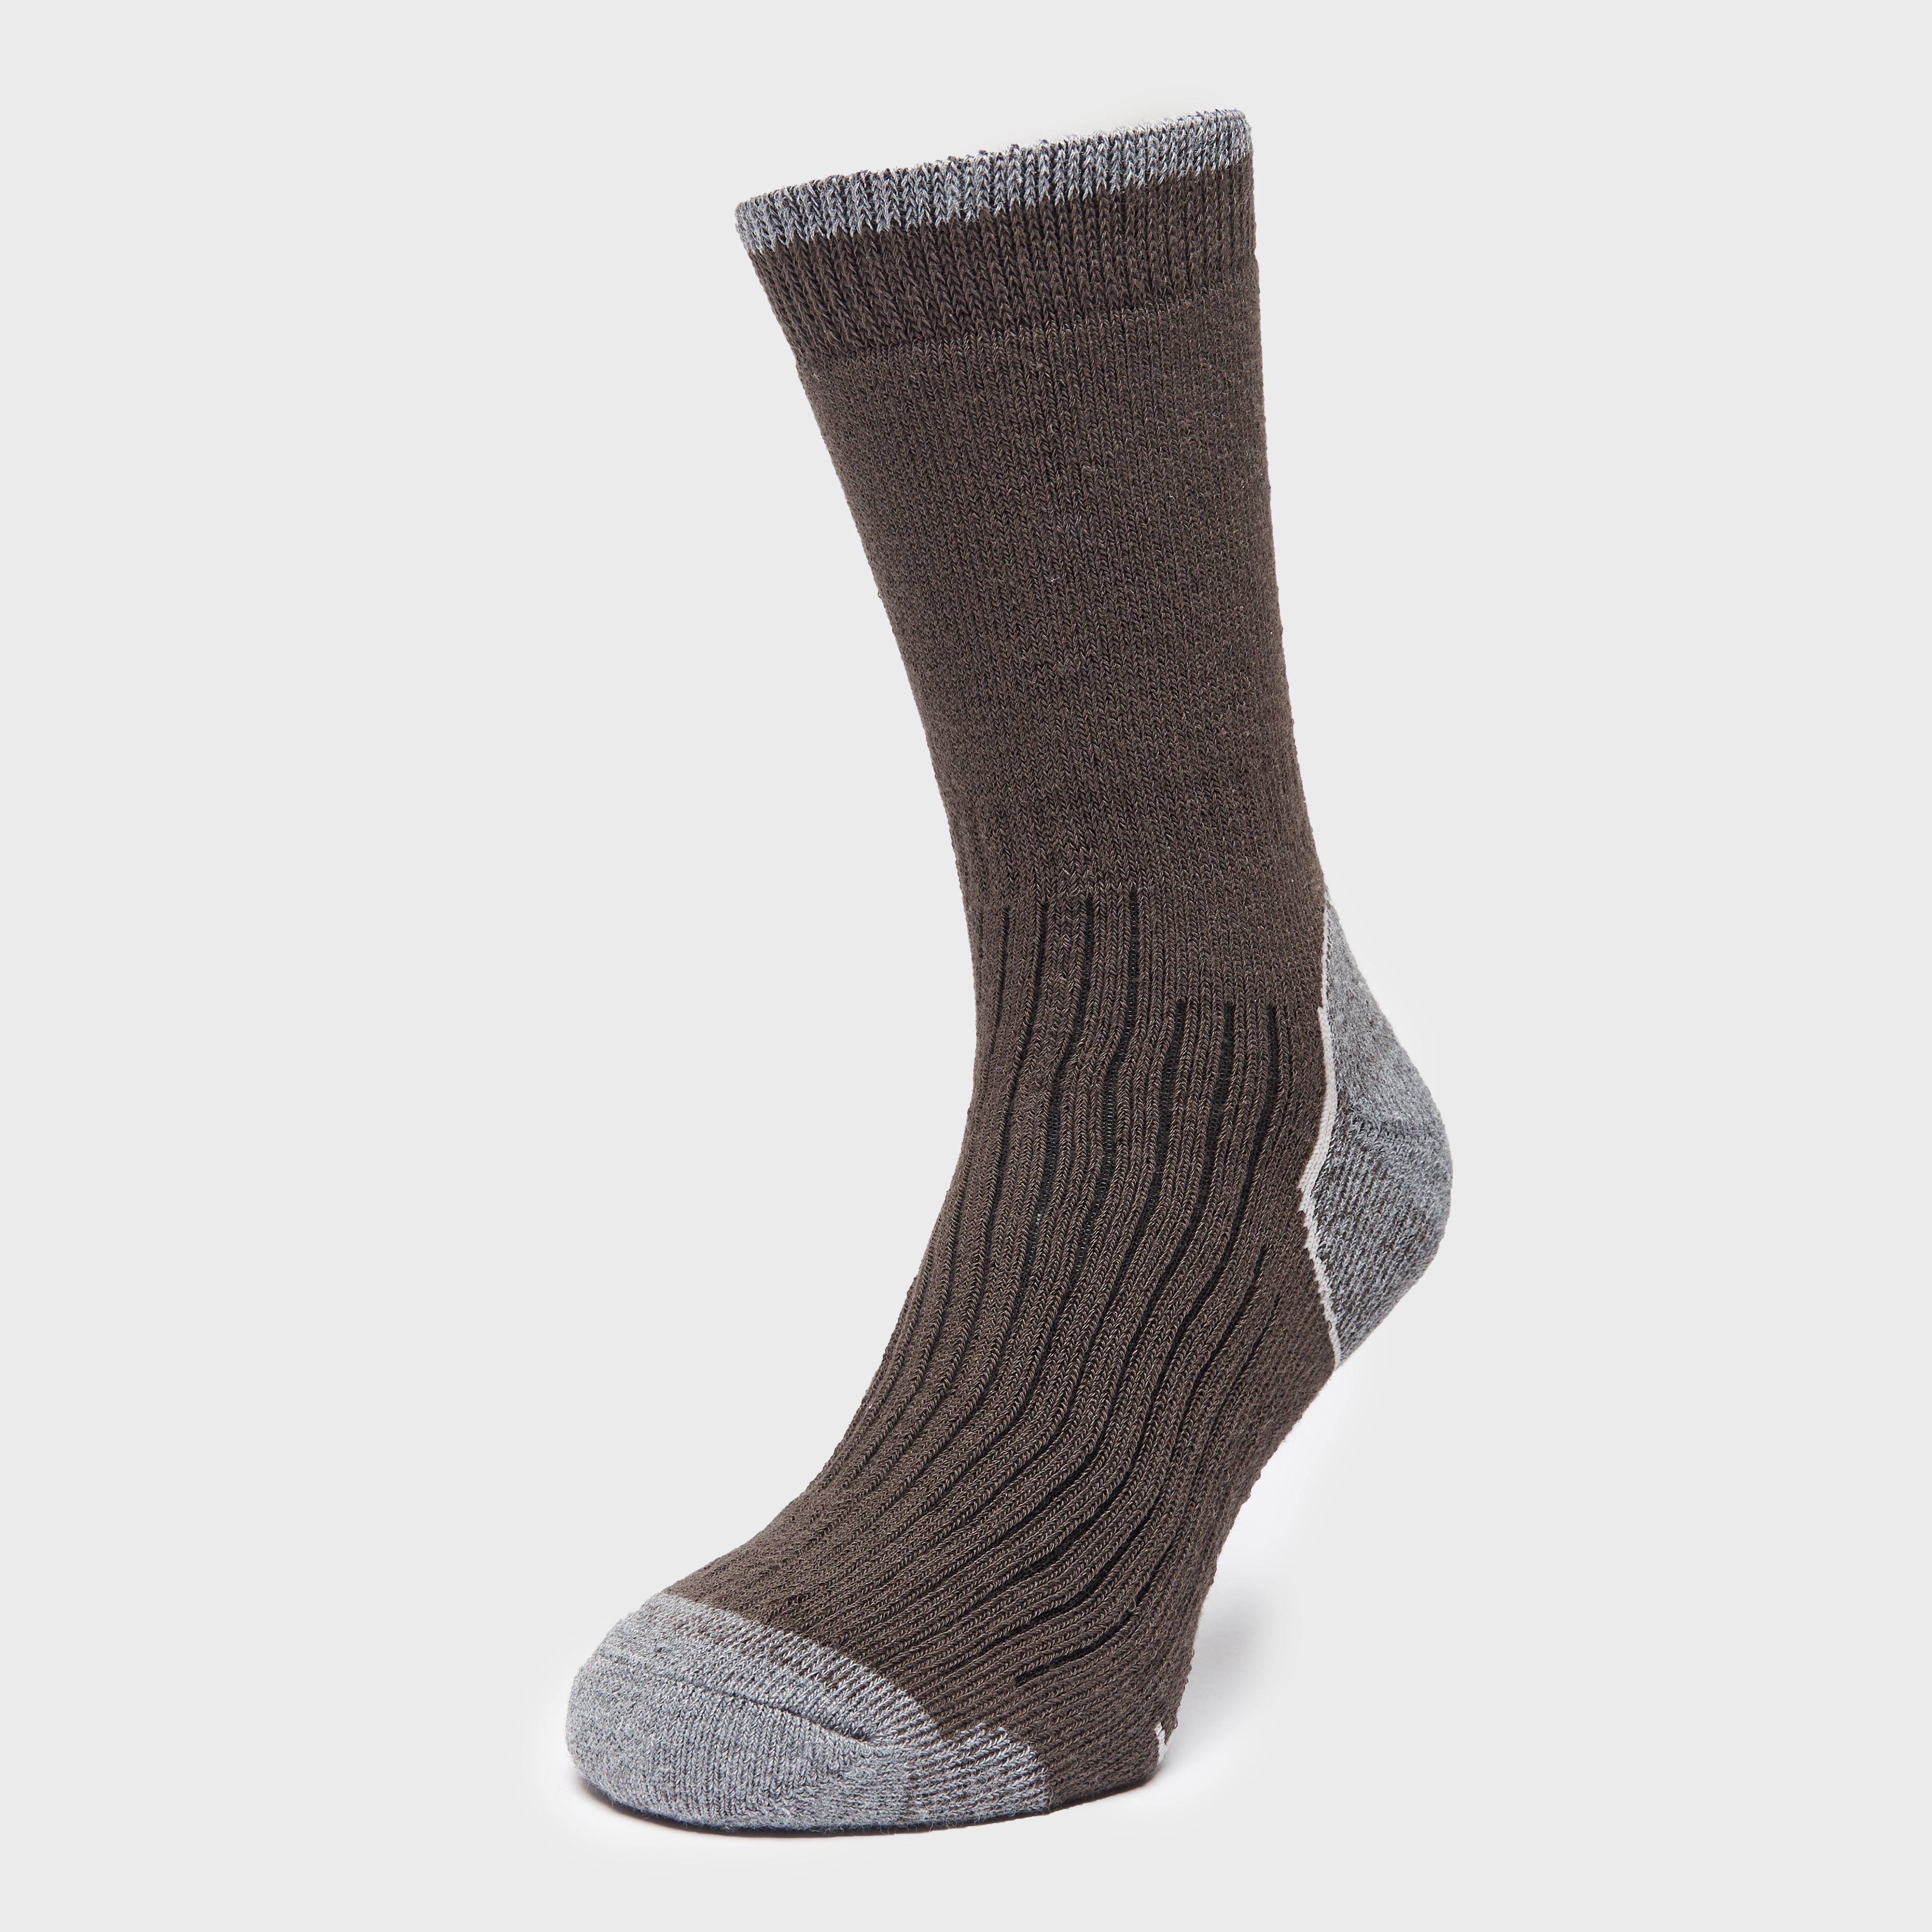 Brasher Brasher Mens Hiker Socks - Brown, Brown